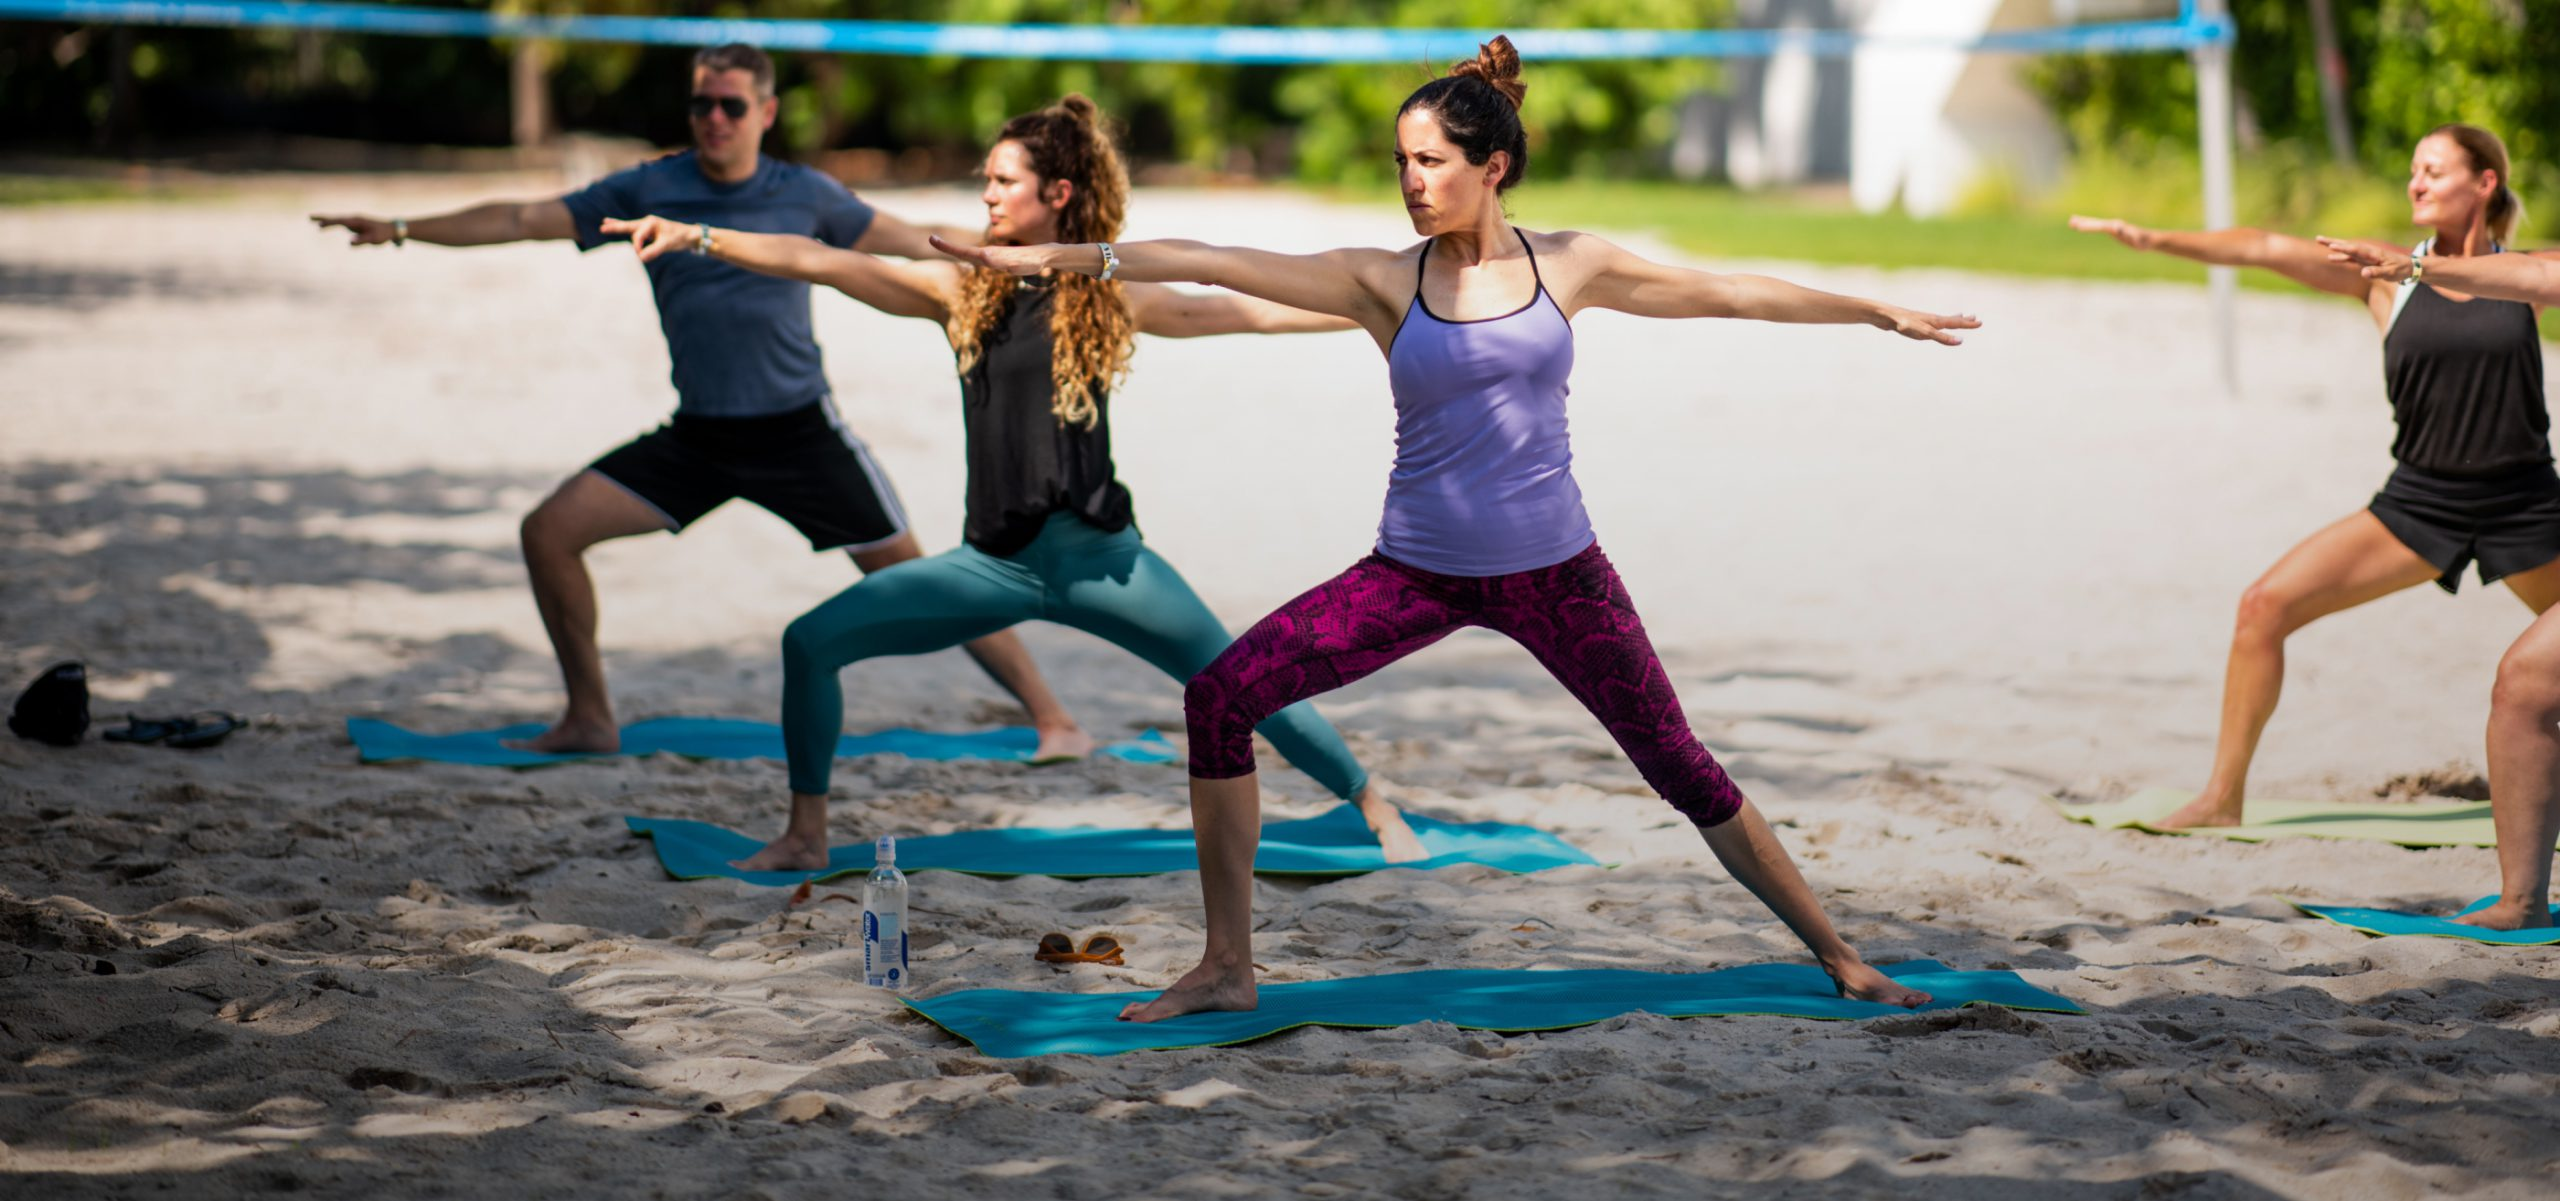 People doing yoga outside